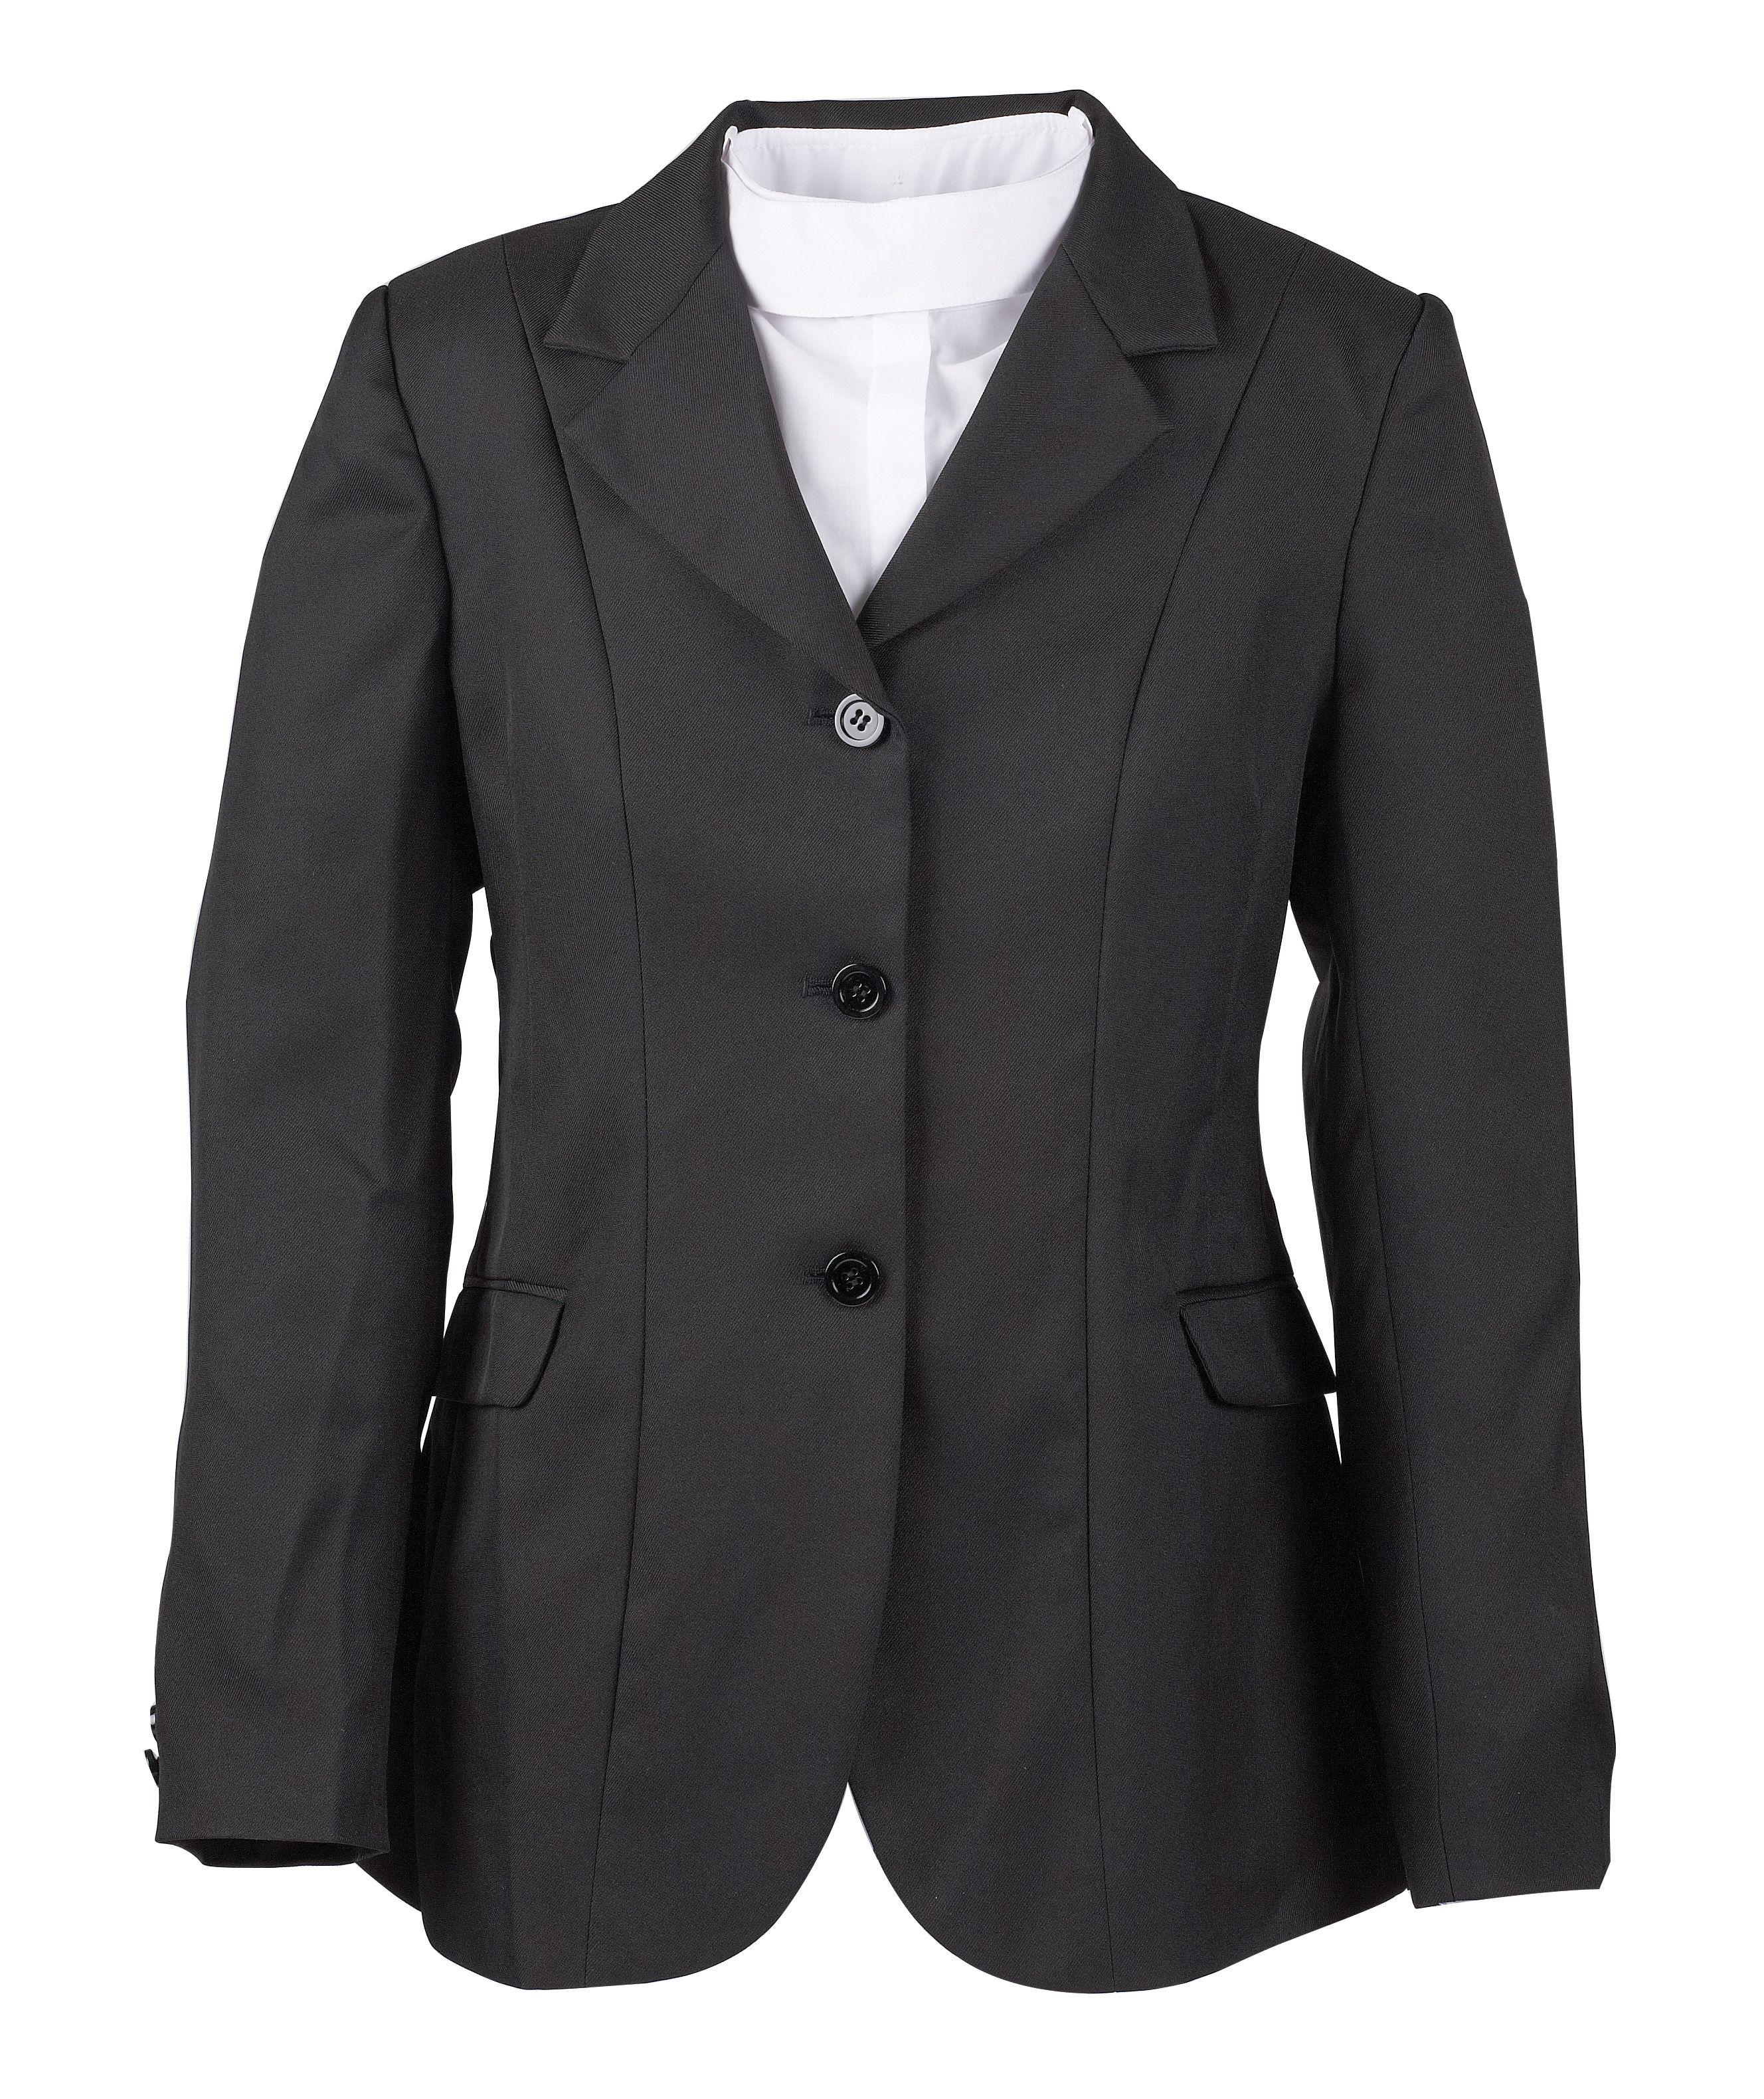 Dublin Ashby Show Coat - Ladies